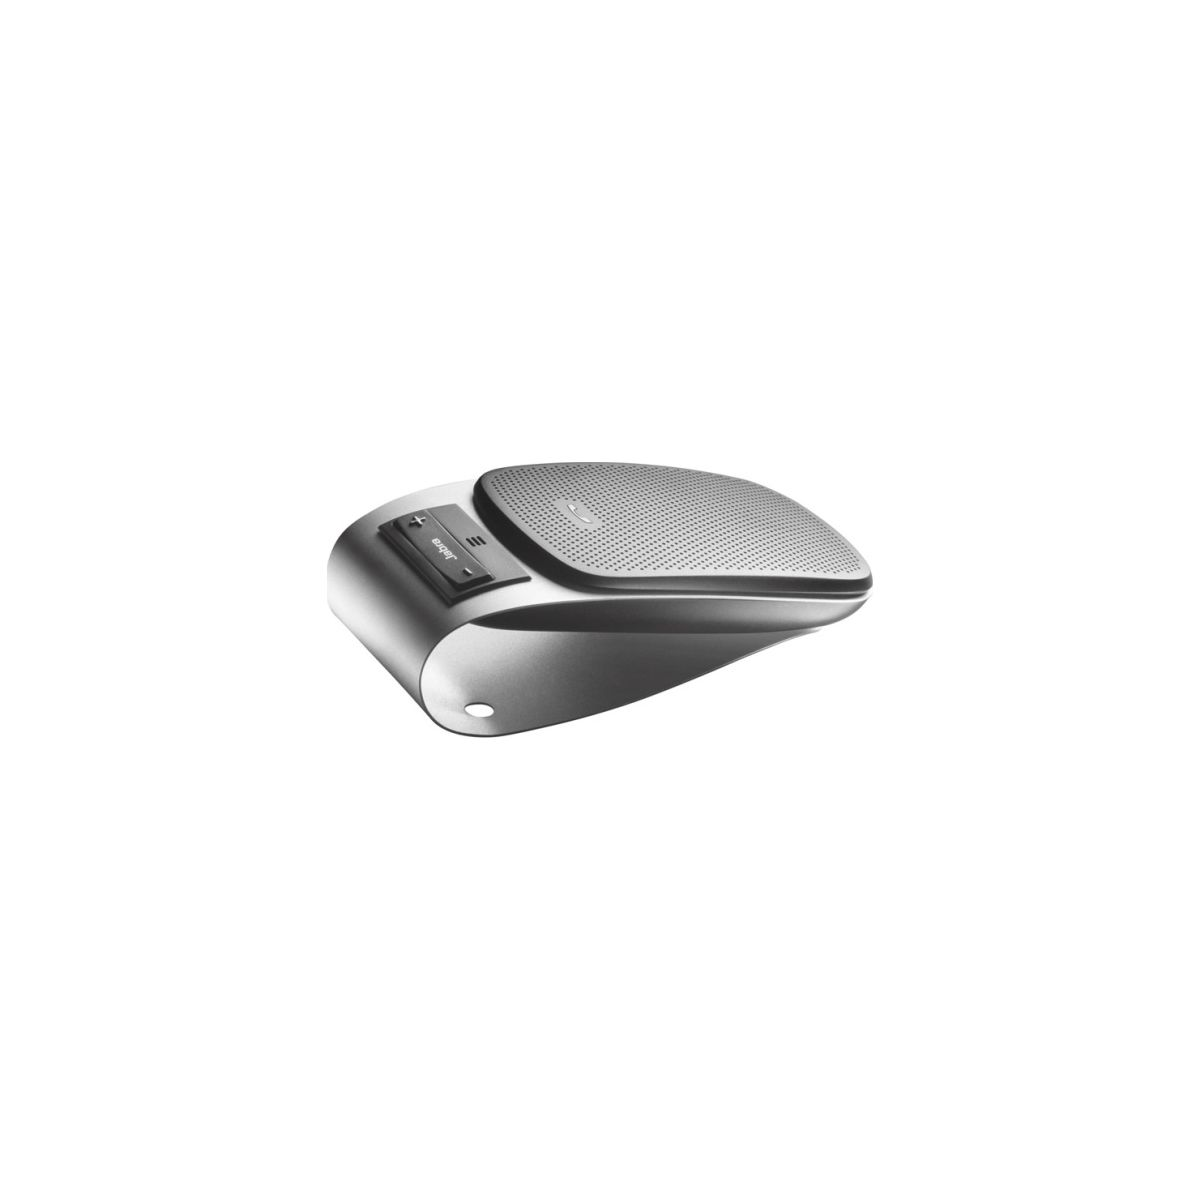 Kit mains libres voiture jabra drive - livraison offerte : code premium (photo)